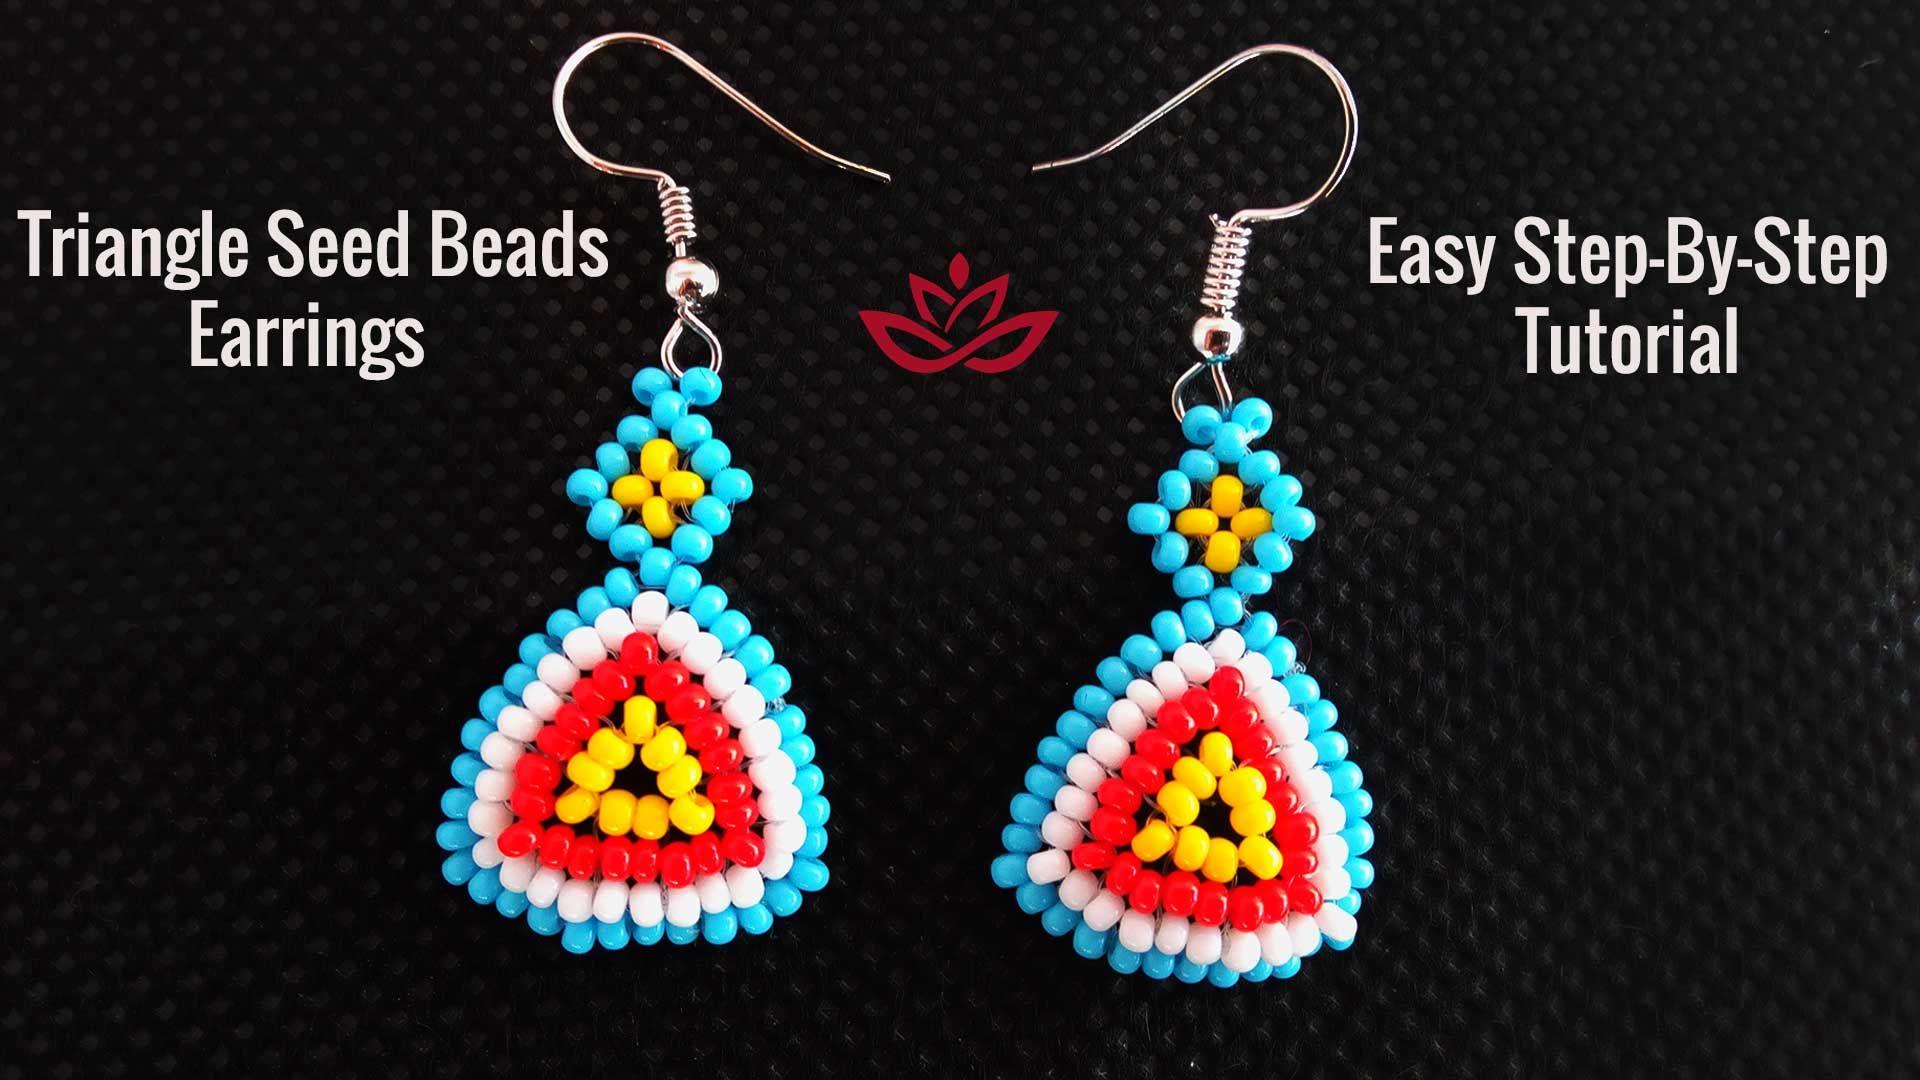 Triangle Seed Beads Earrings Tutorial How To Make Diy Seed